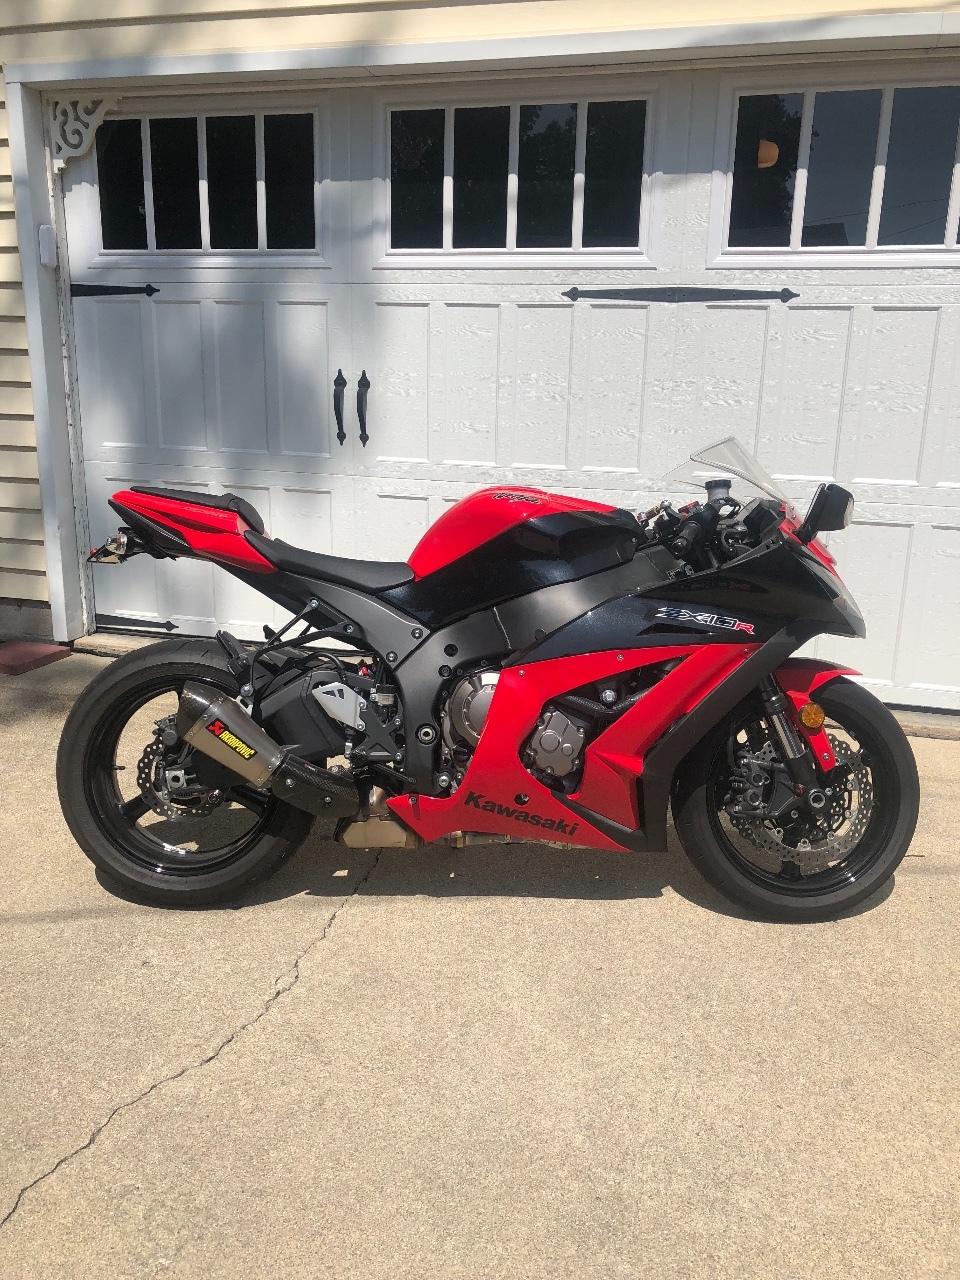 Motorcycle IL Planet-7: description, specifications, photos 74